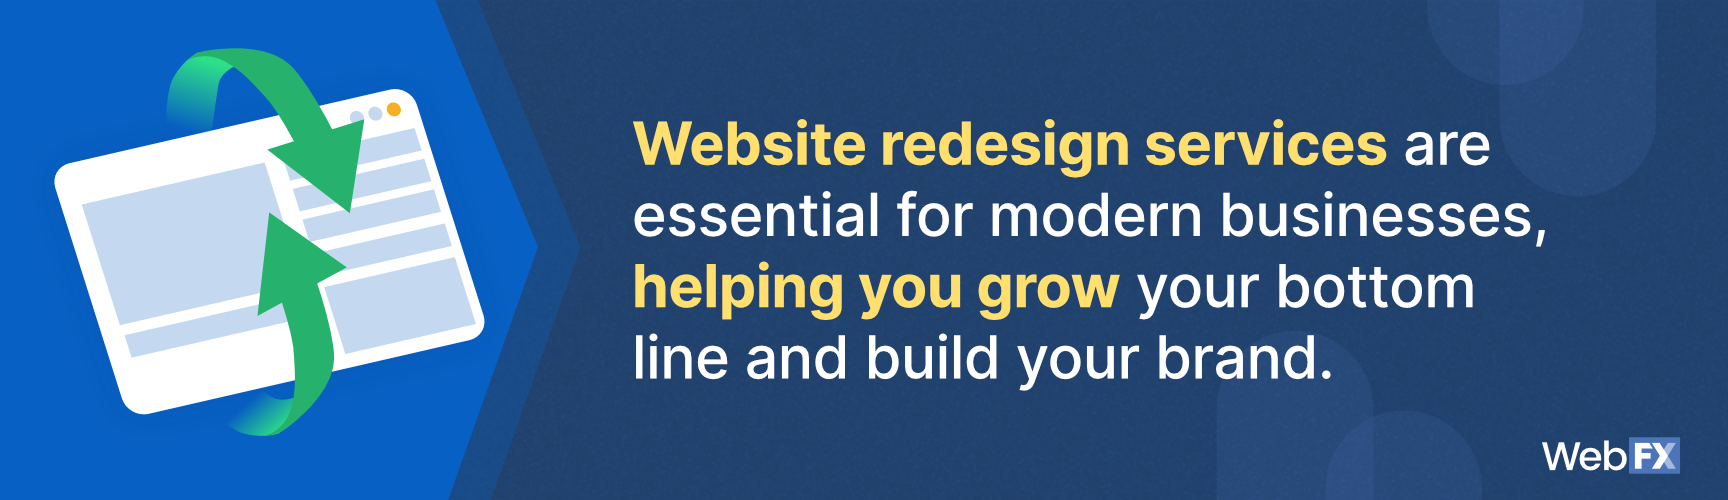 Website redesign services help modern businesses grow their bottom line